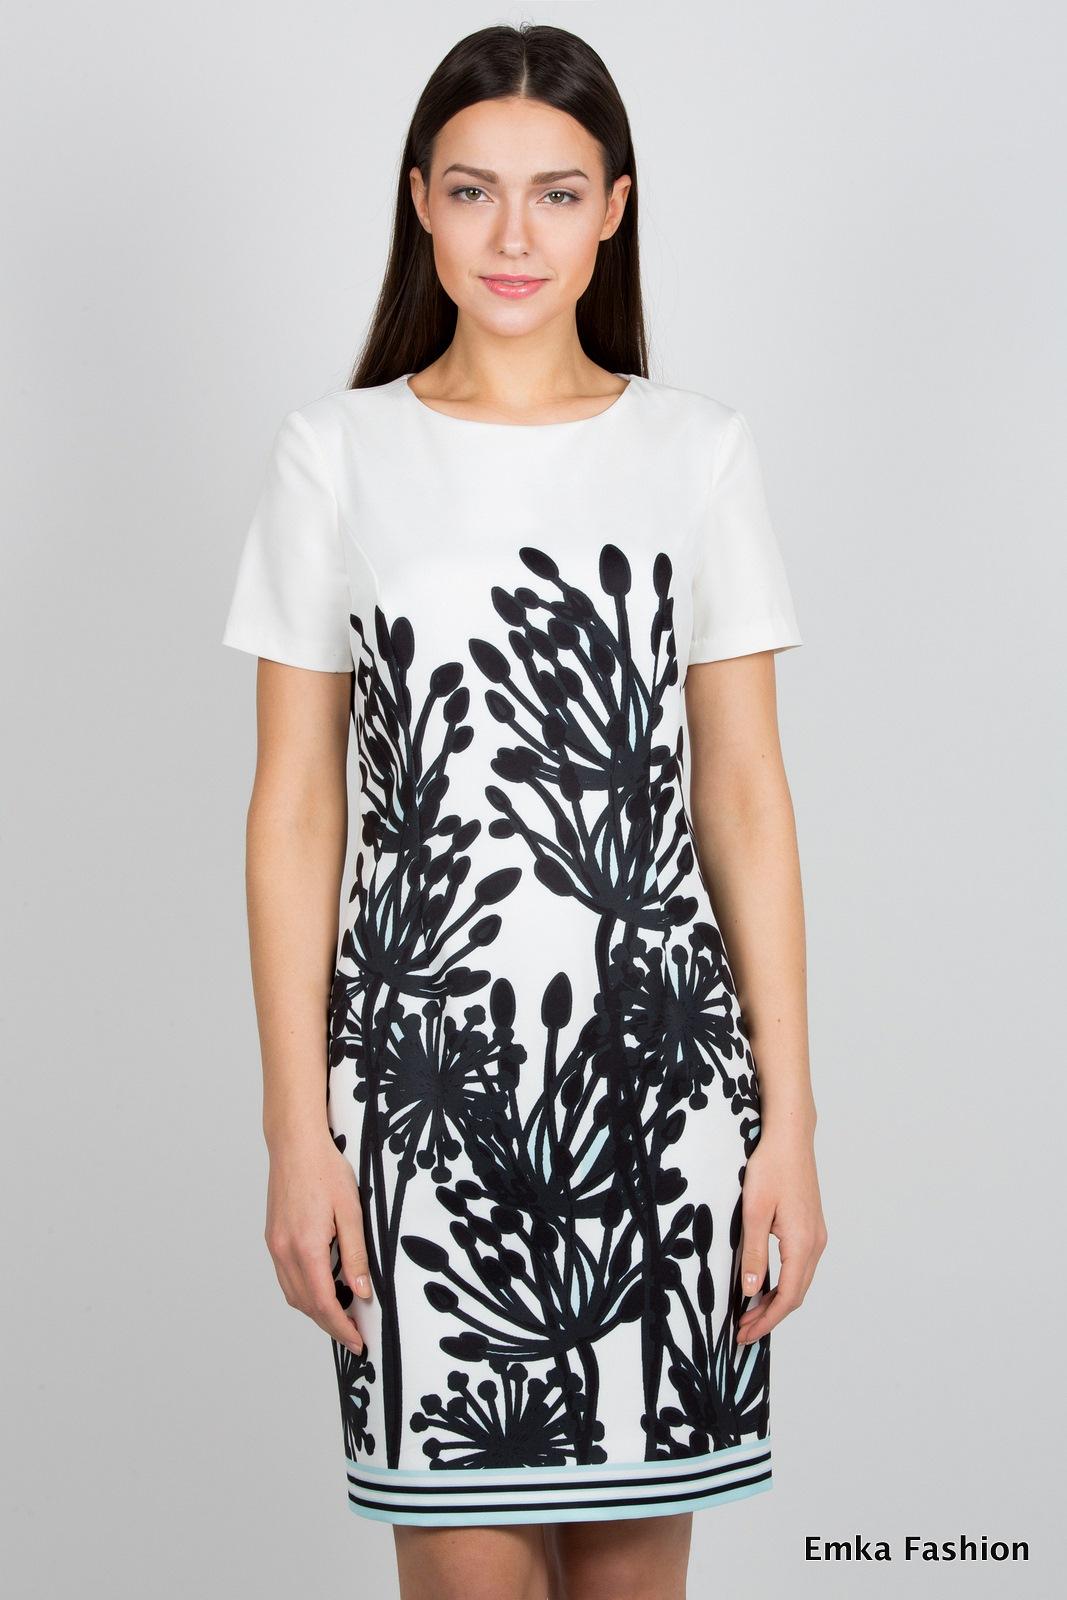 77153df9e55 Бело-чёрное платье Emka Fashion PL-419 zoryana - Malinka-fashion.ru